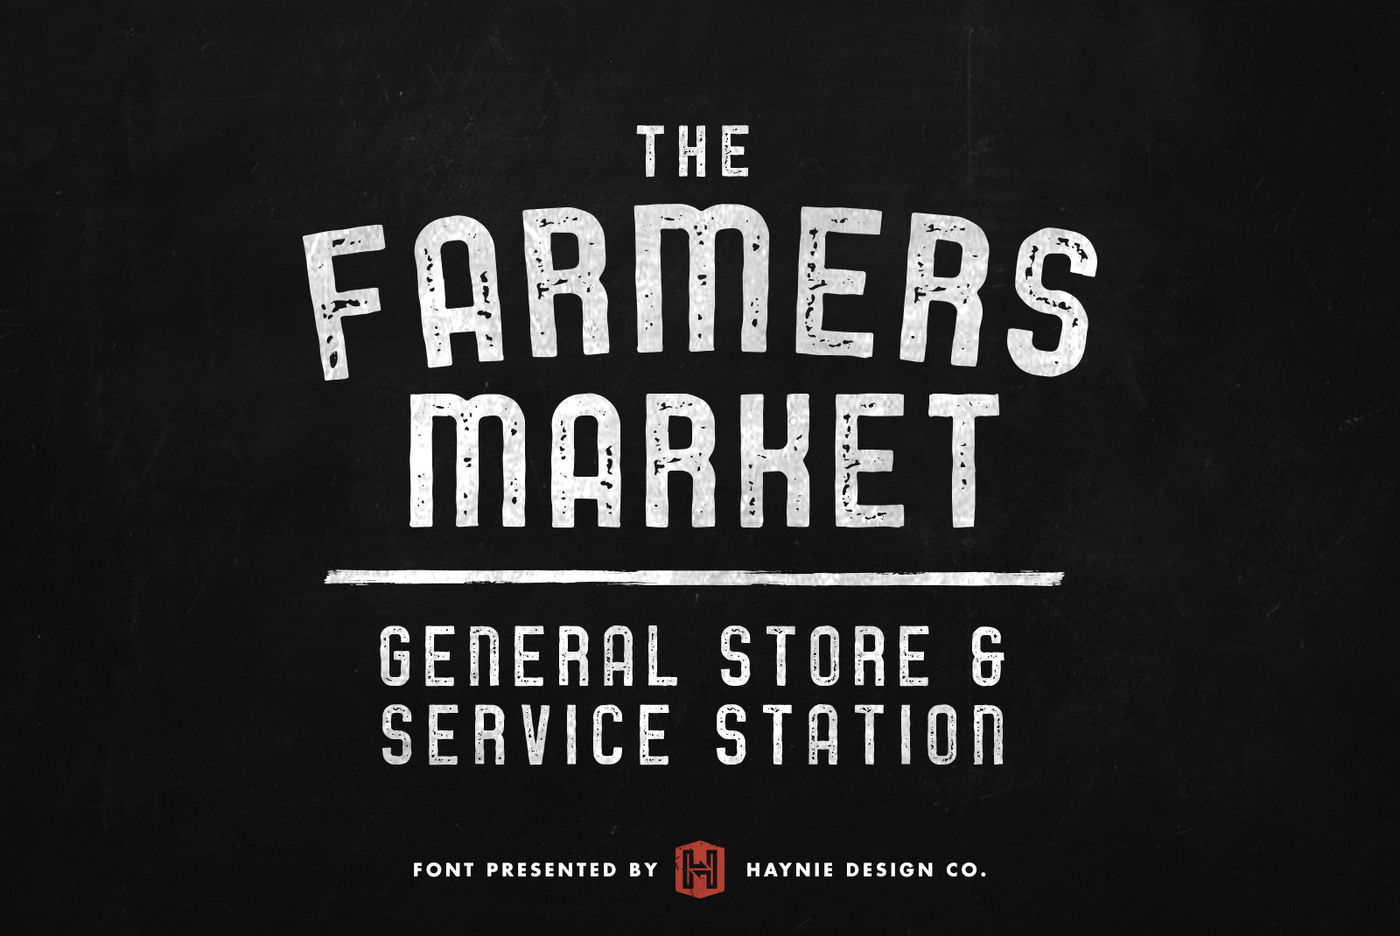 Service Station Vintage Farmers Market Font By Haynie Design Co